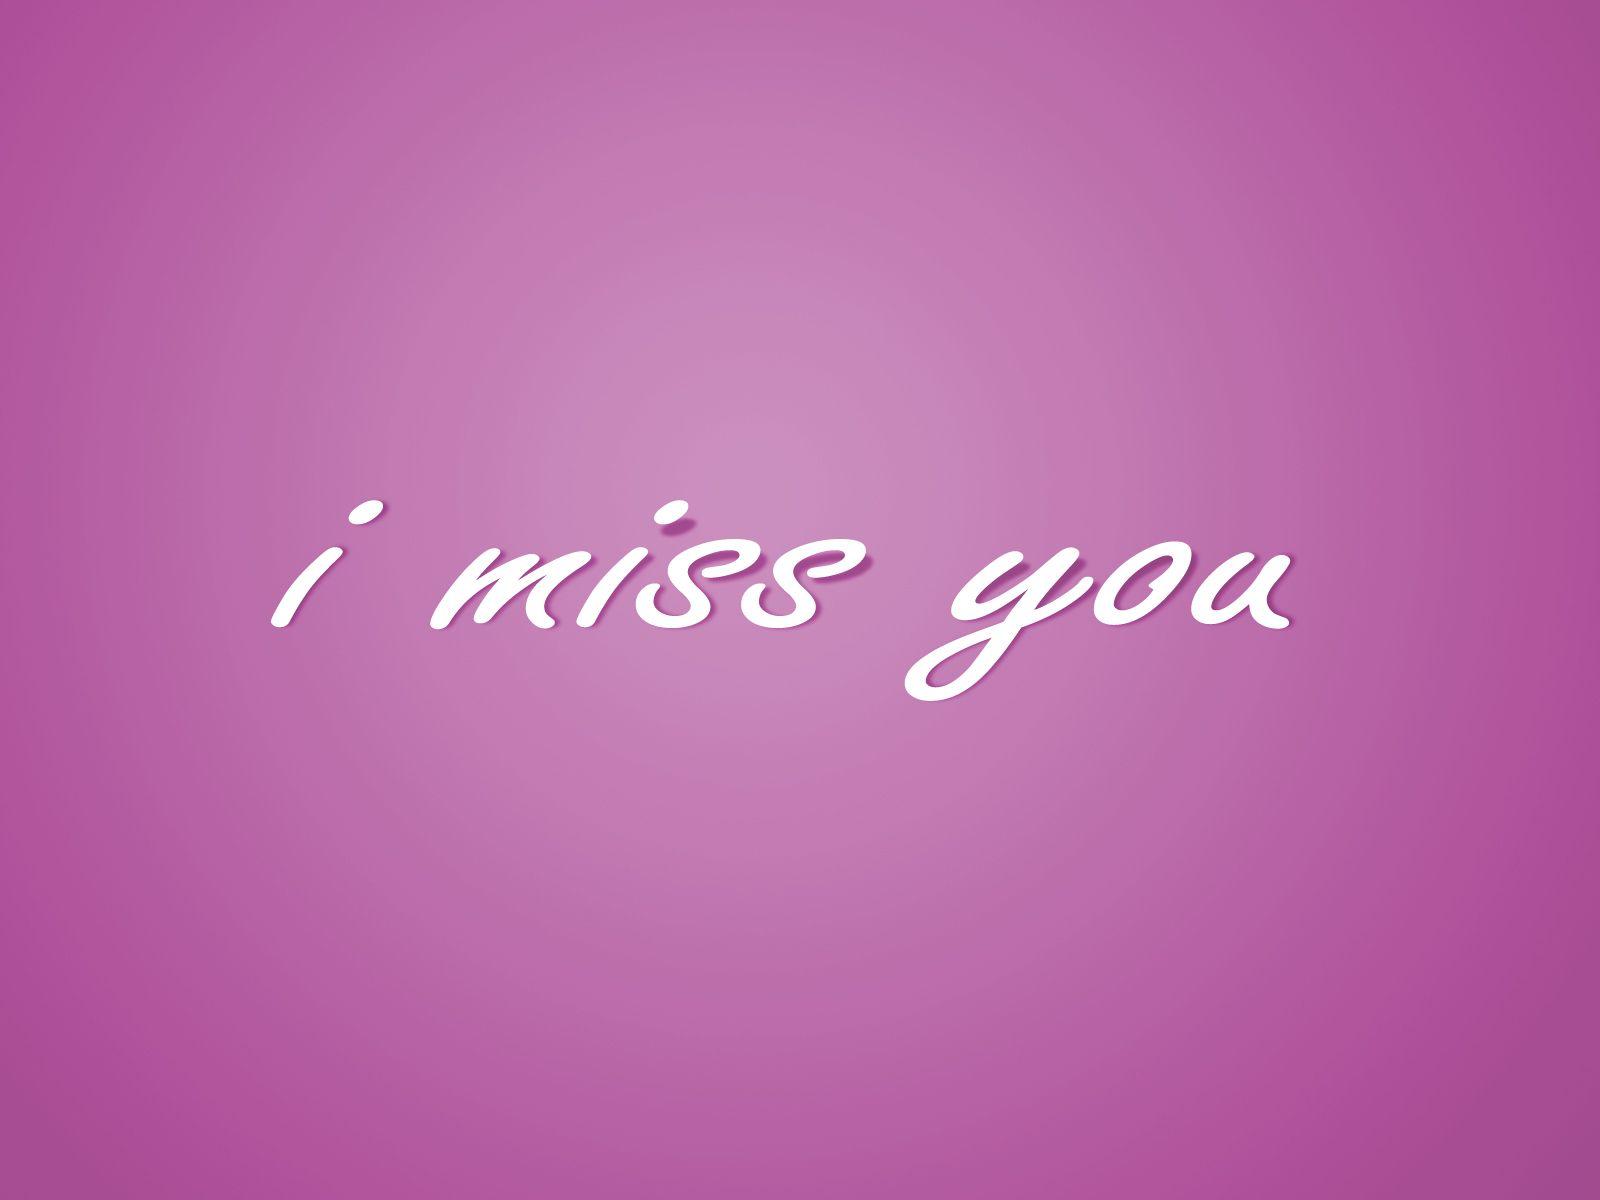 I Miss You Moon My heart hd wallpaper HD Wallpapers